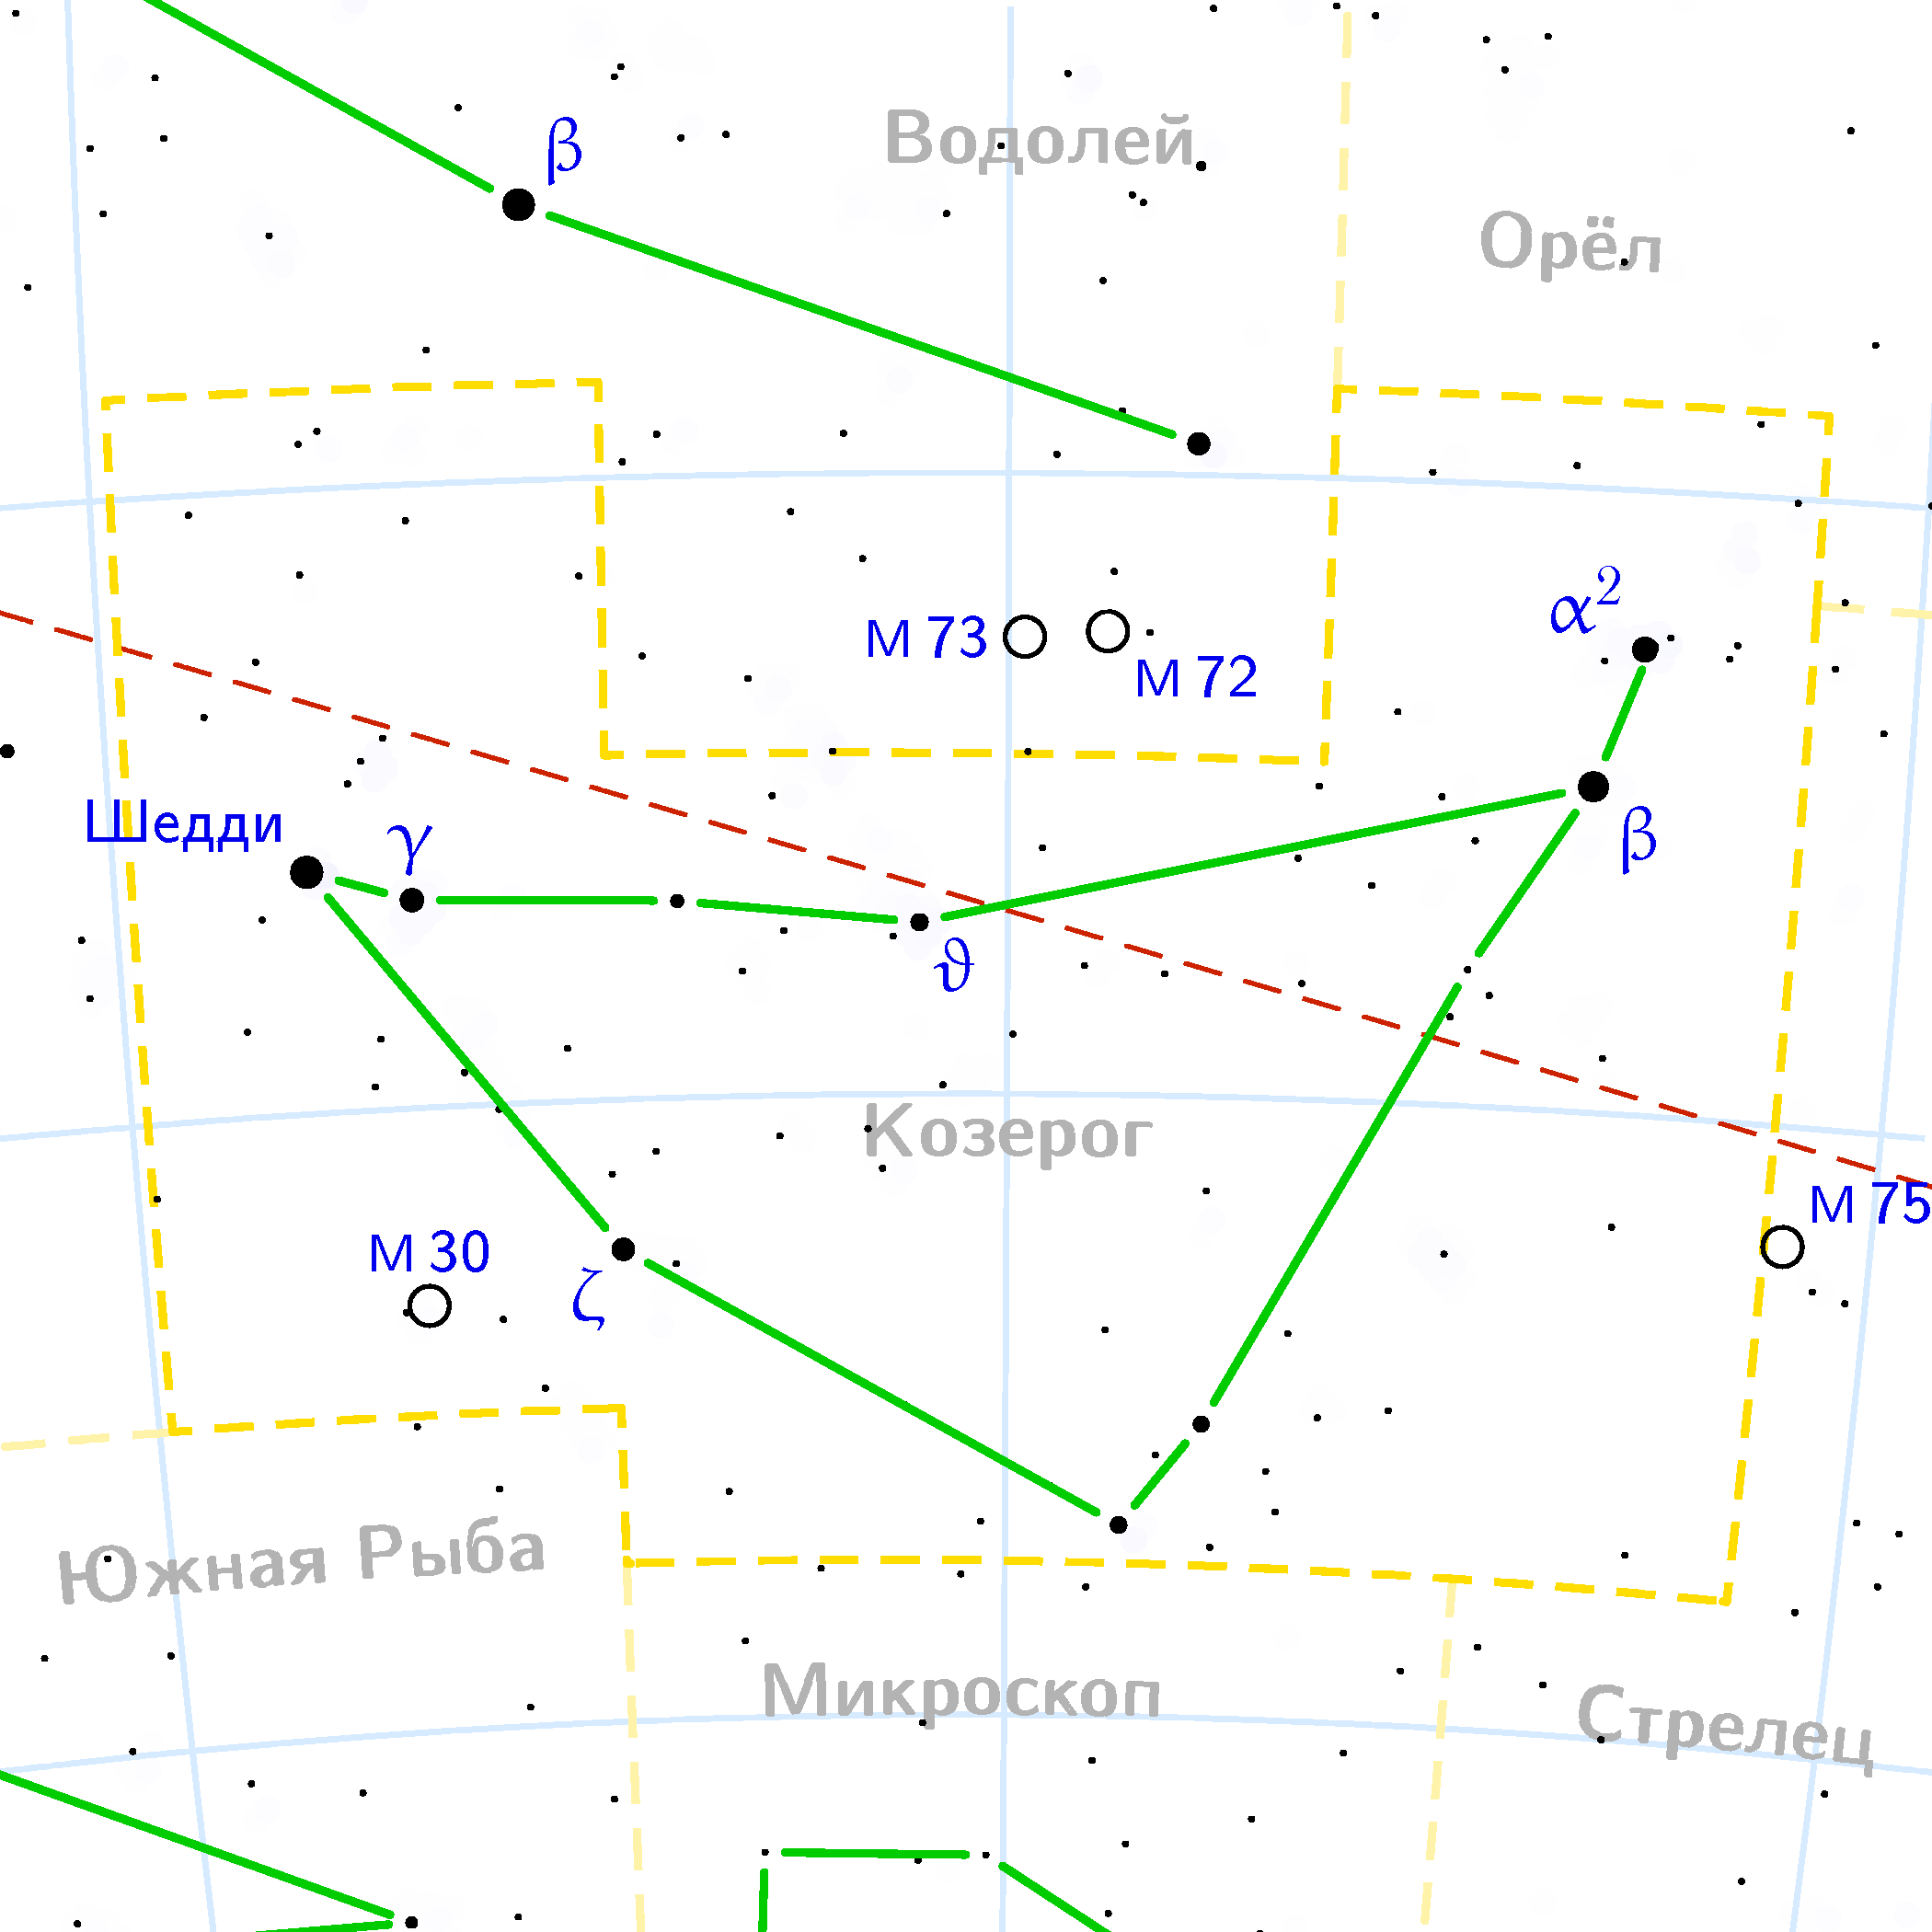 Доклад на тему созвездия козерог 4621